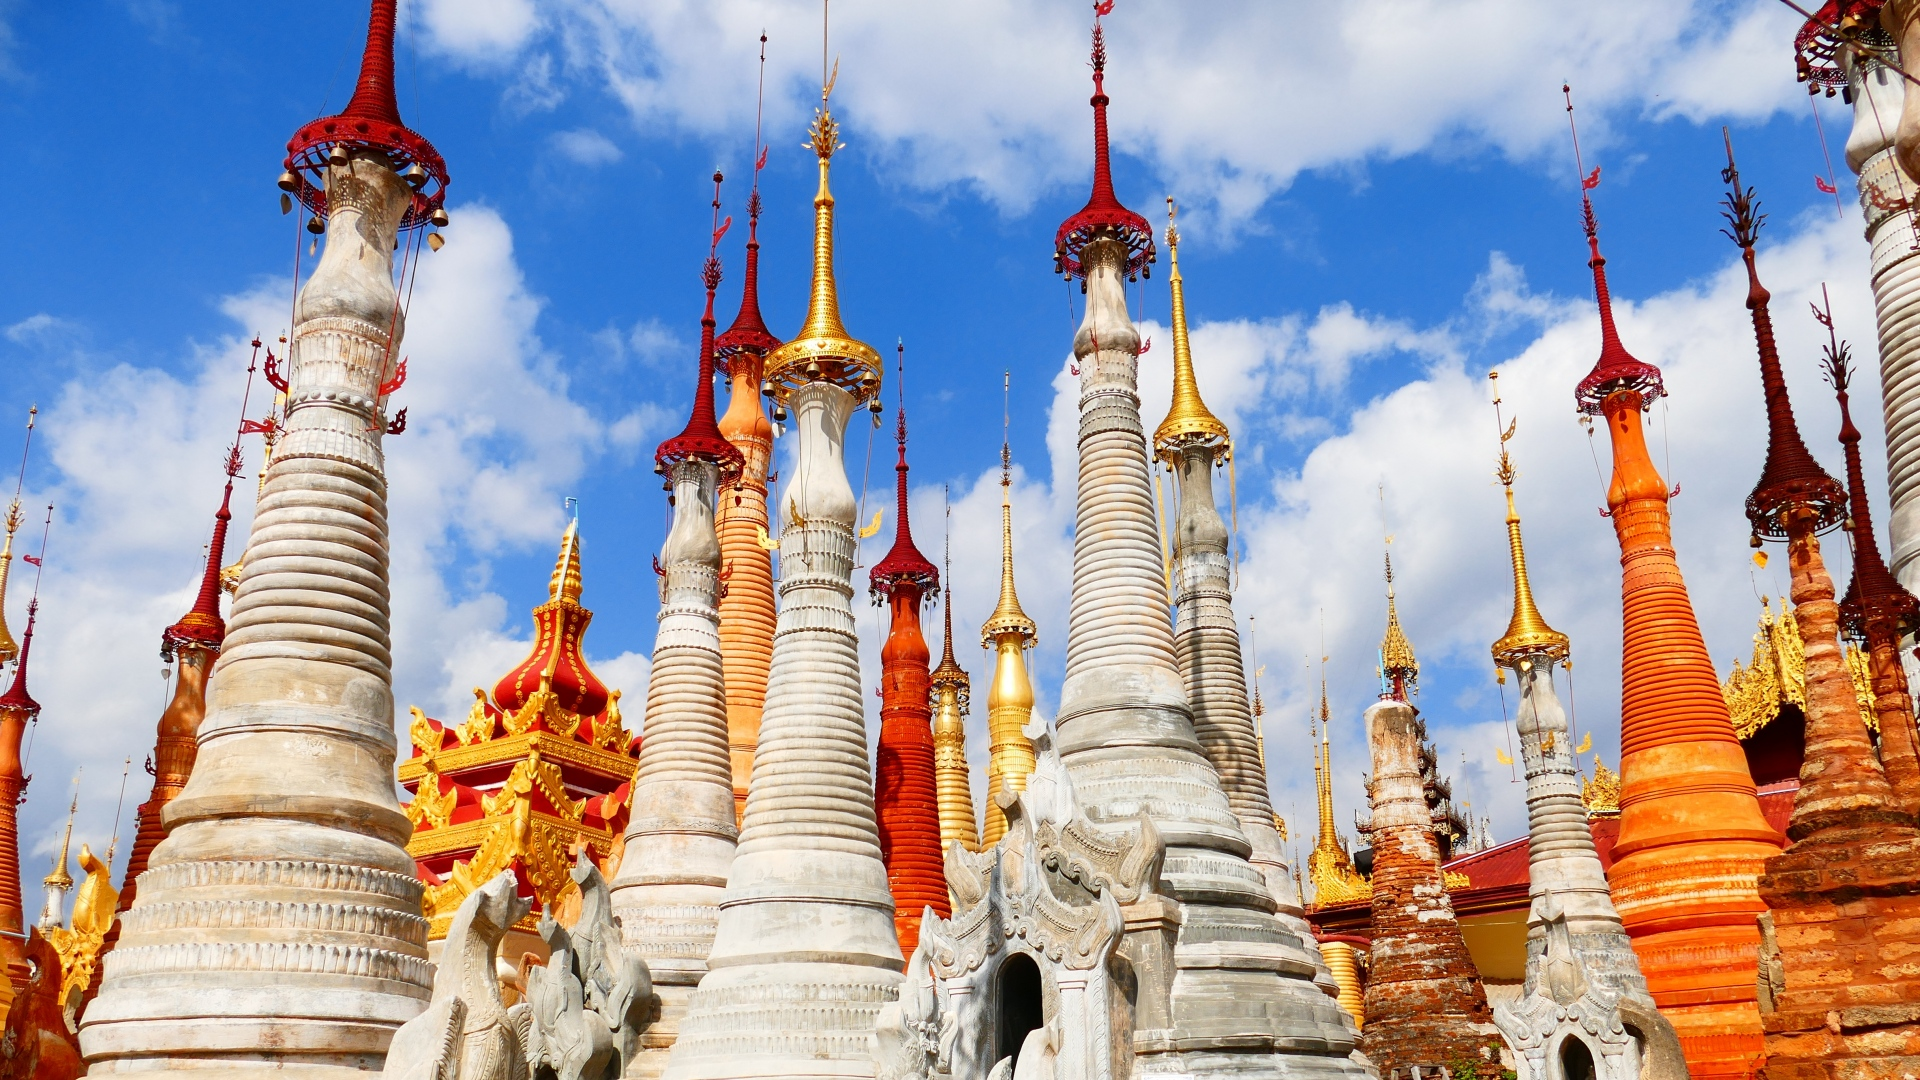 hd hintergrundbilder birma tempel pagode myanmar architektur gebäude 1920x1080